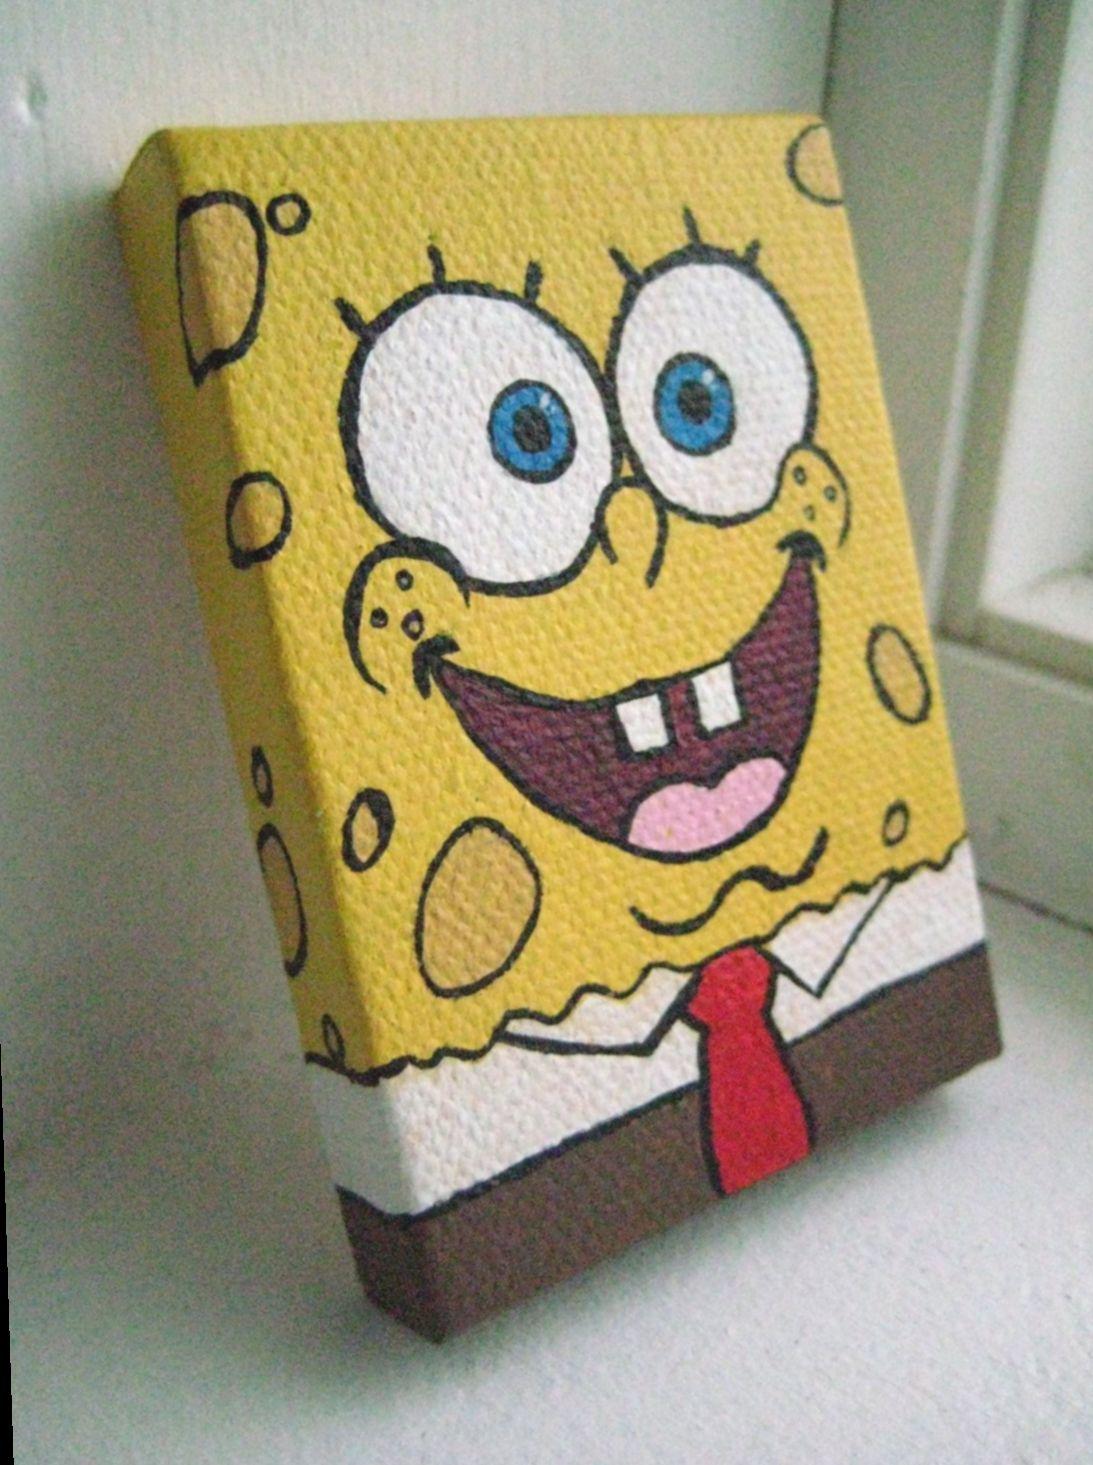 Cute Things To Paint Spongebob Maedemenina Princess Modainfantil Diy Canvas Art Mini Canvas Art Diy Art Painting